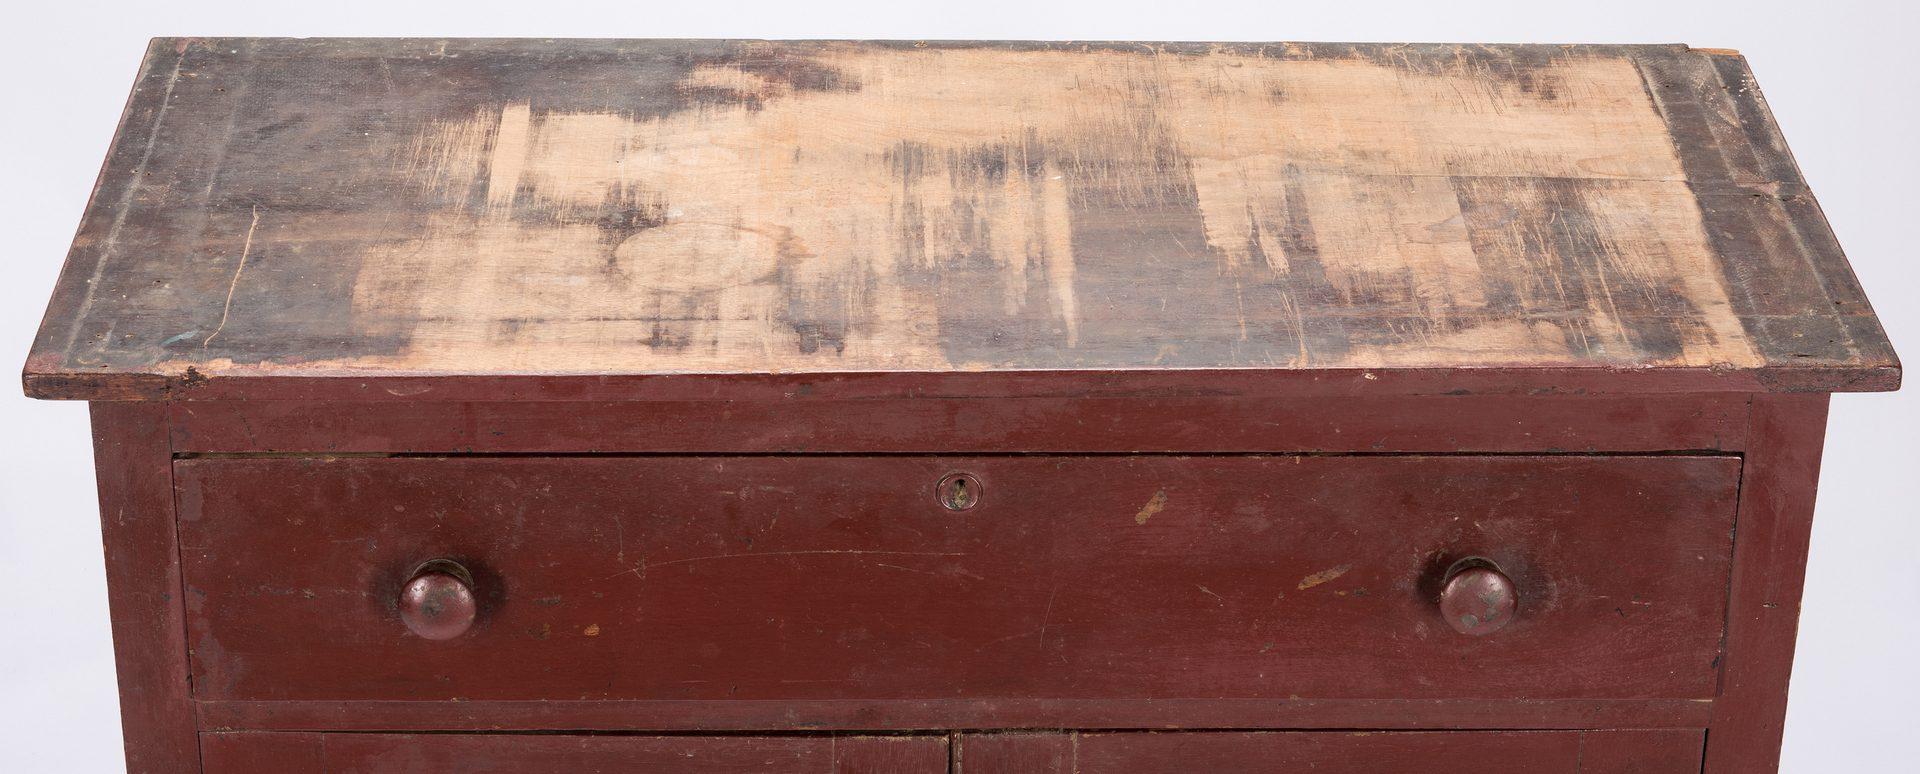 Lot 139: SW Virginia Painted Pie Safe, Eagle Tins